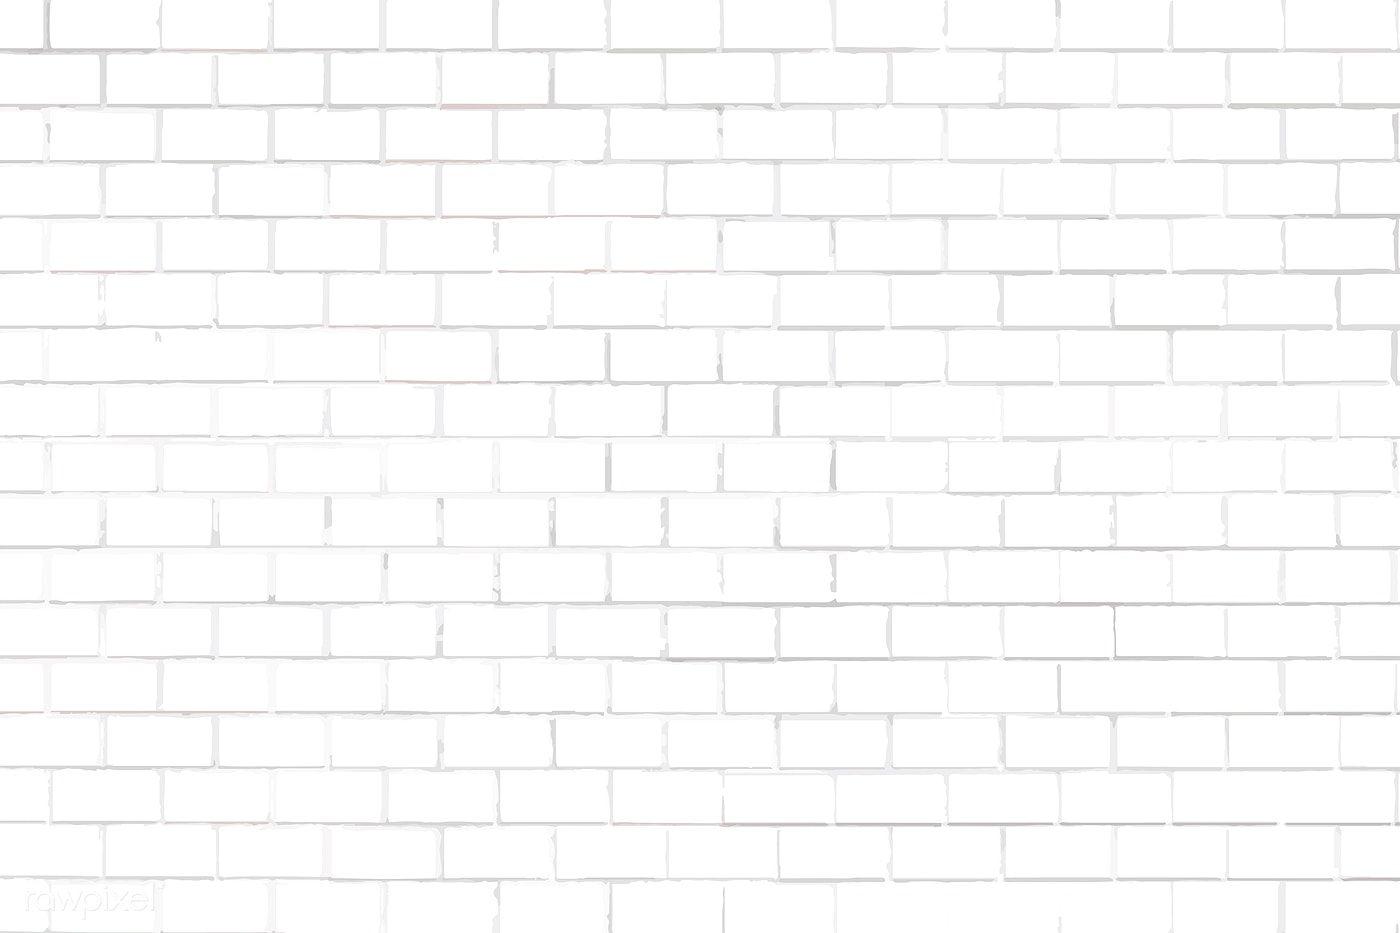 Brick Textured Background Vector Free Image By Rawpixel Com Niwat Brick Wall Background Brick Texture Black Brick Wall